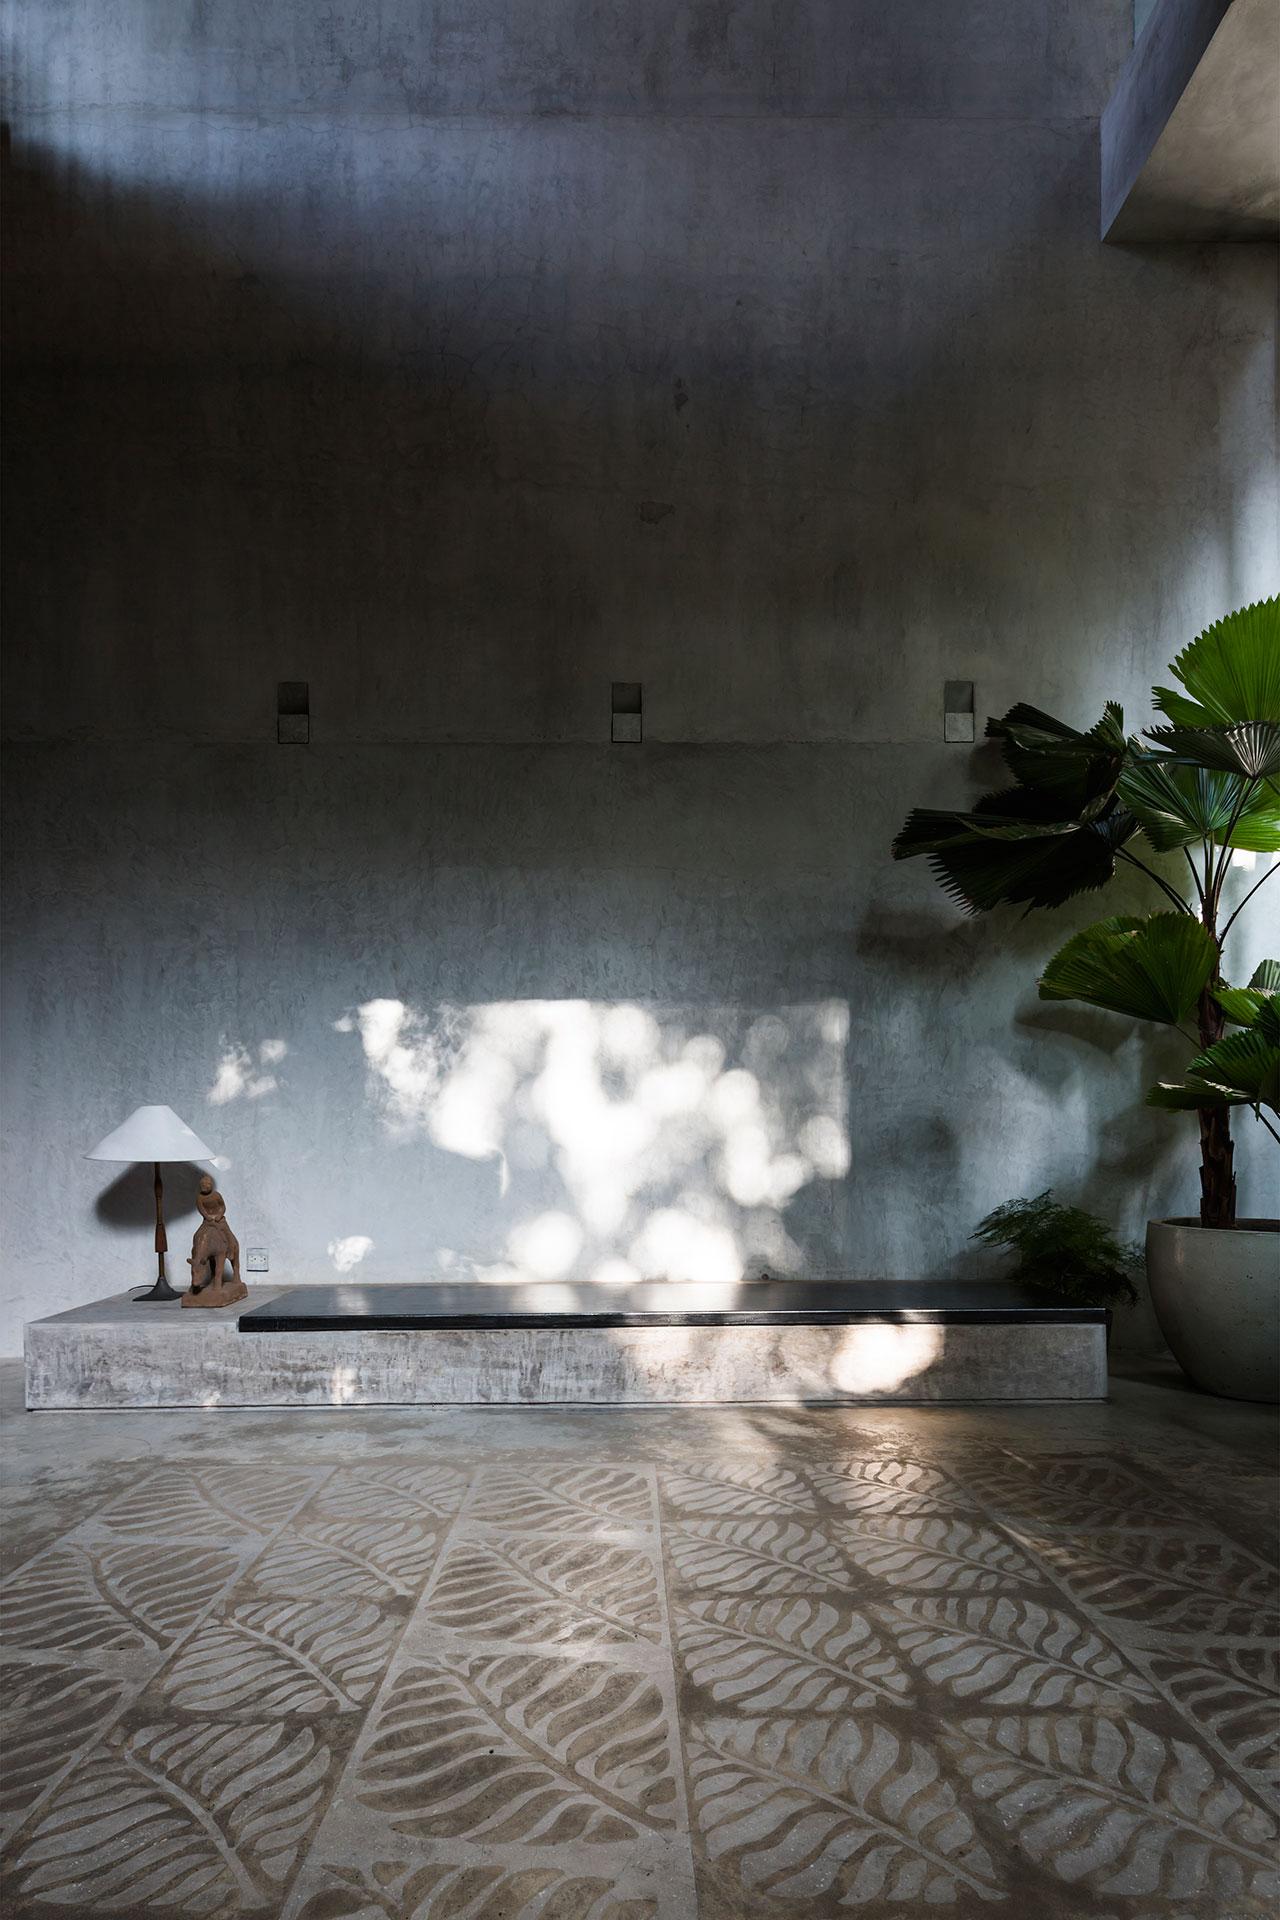 f4_thong_house_nishizawaarchitects_photo_hiroyuki_oki_yatzer.jpg